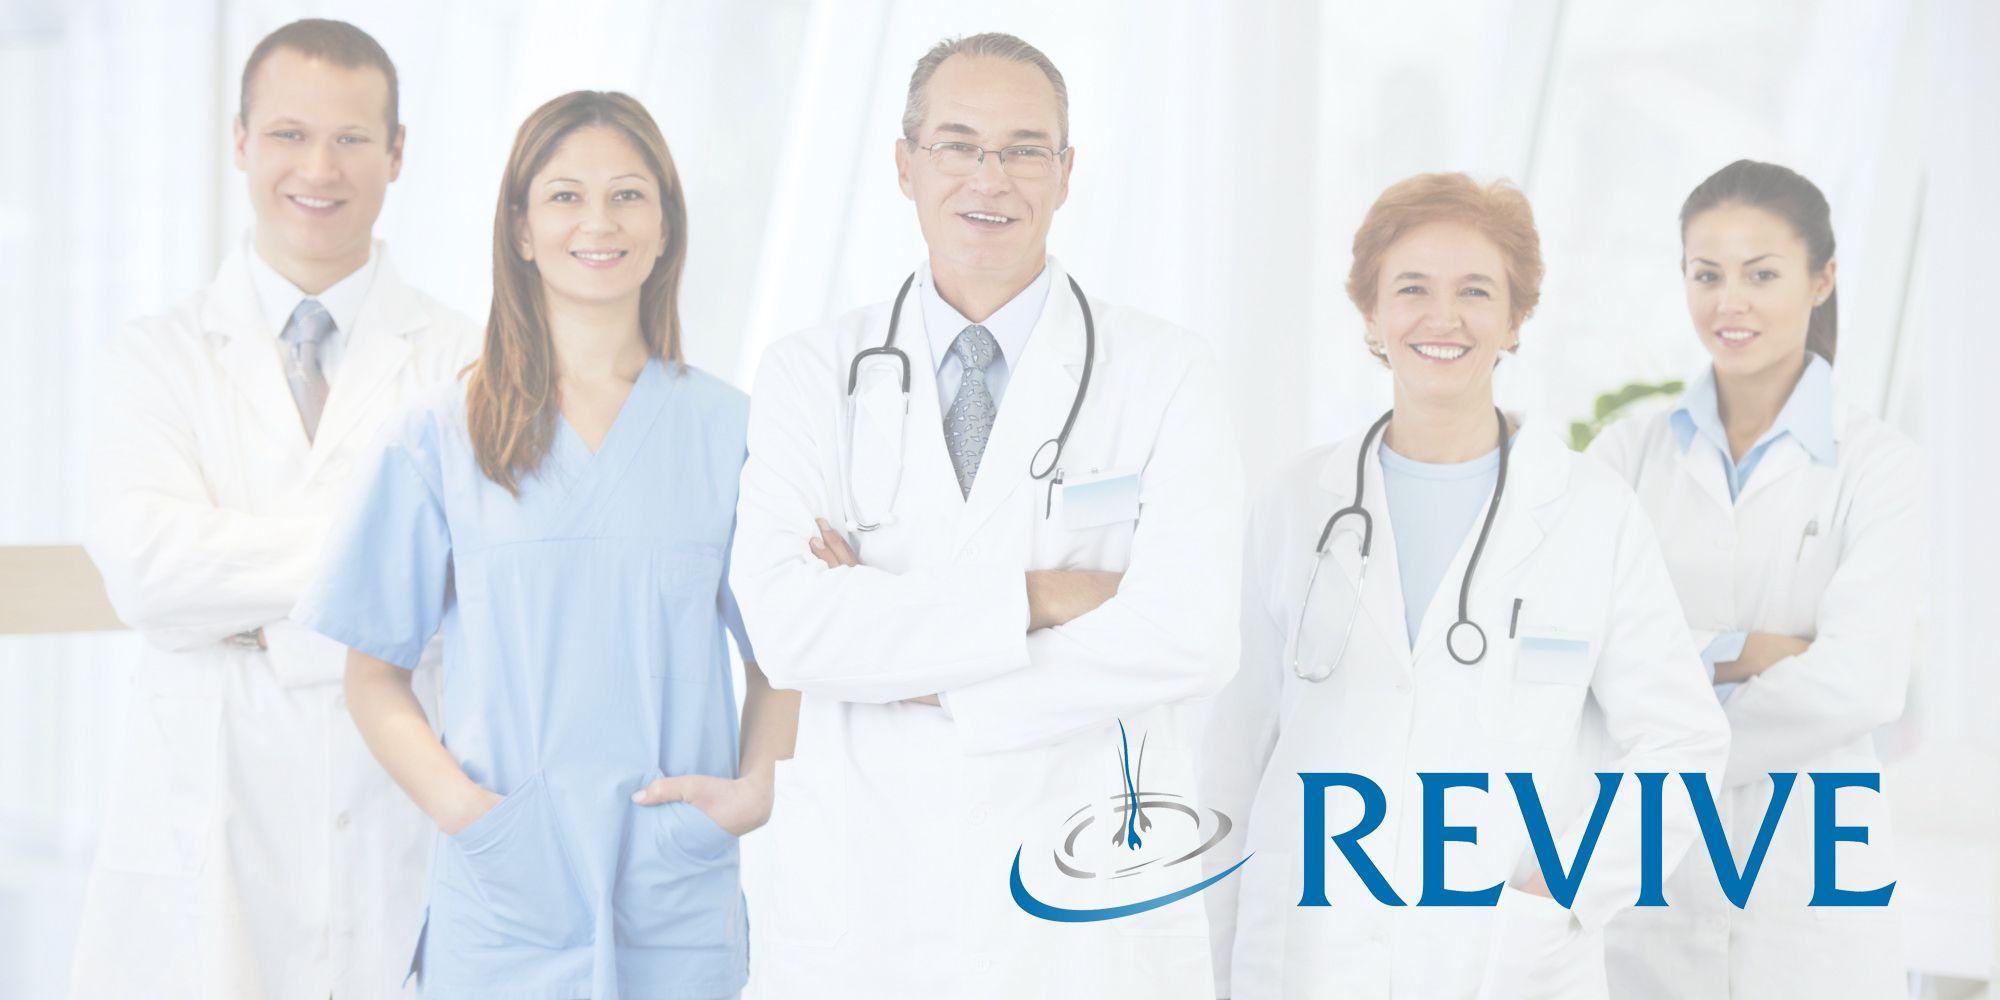 REVIVE Haartransplantation Hamburg Medical jobs, Medical